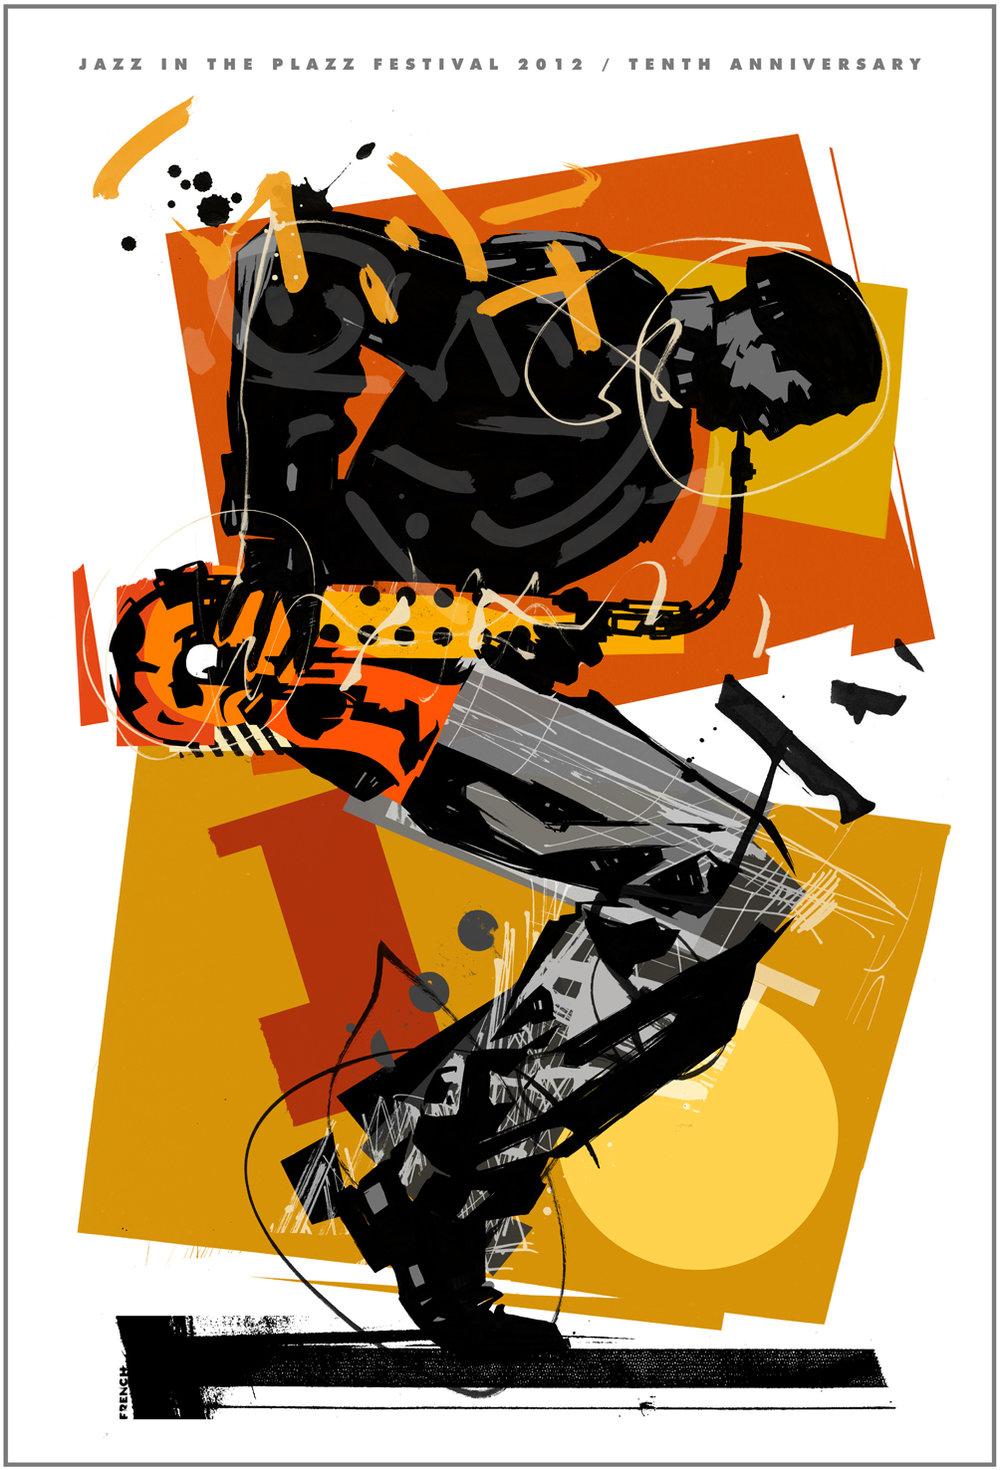 jazz.plazz.work.jpg